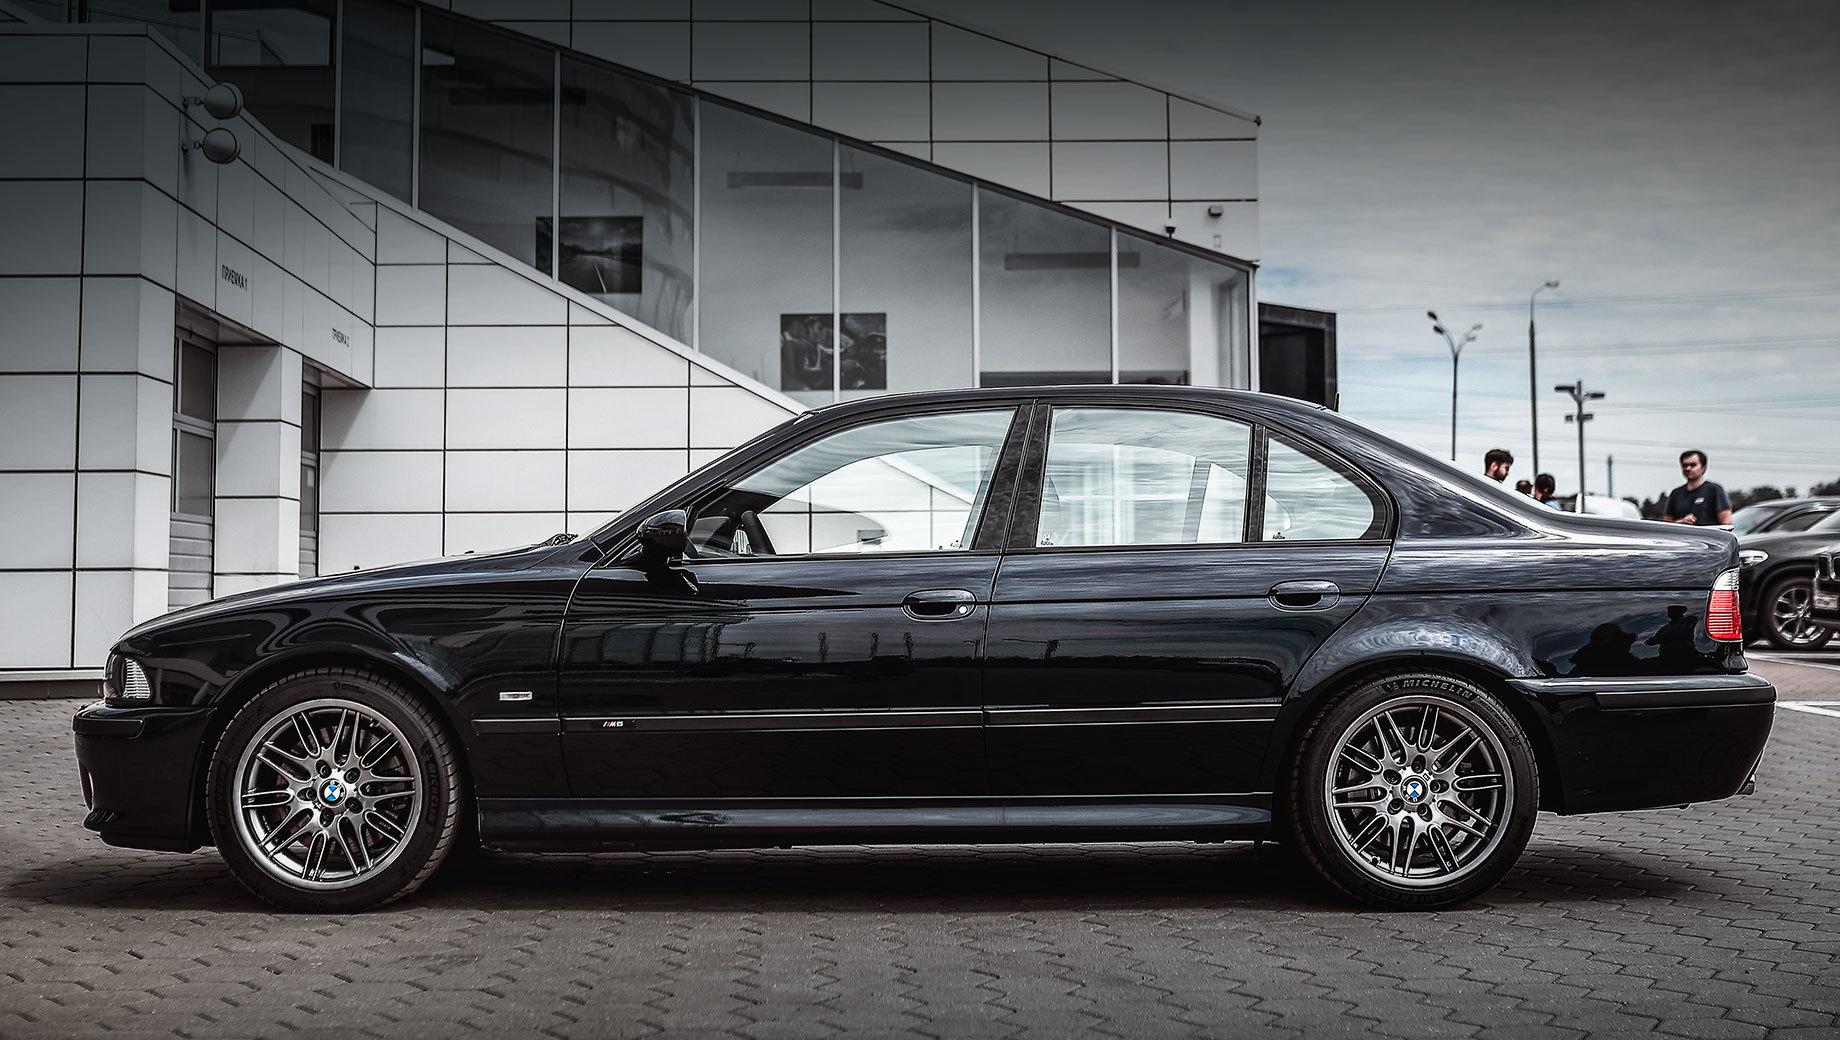 Промо: BMW М5 Е39. Возрождение легенды